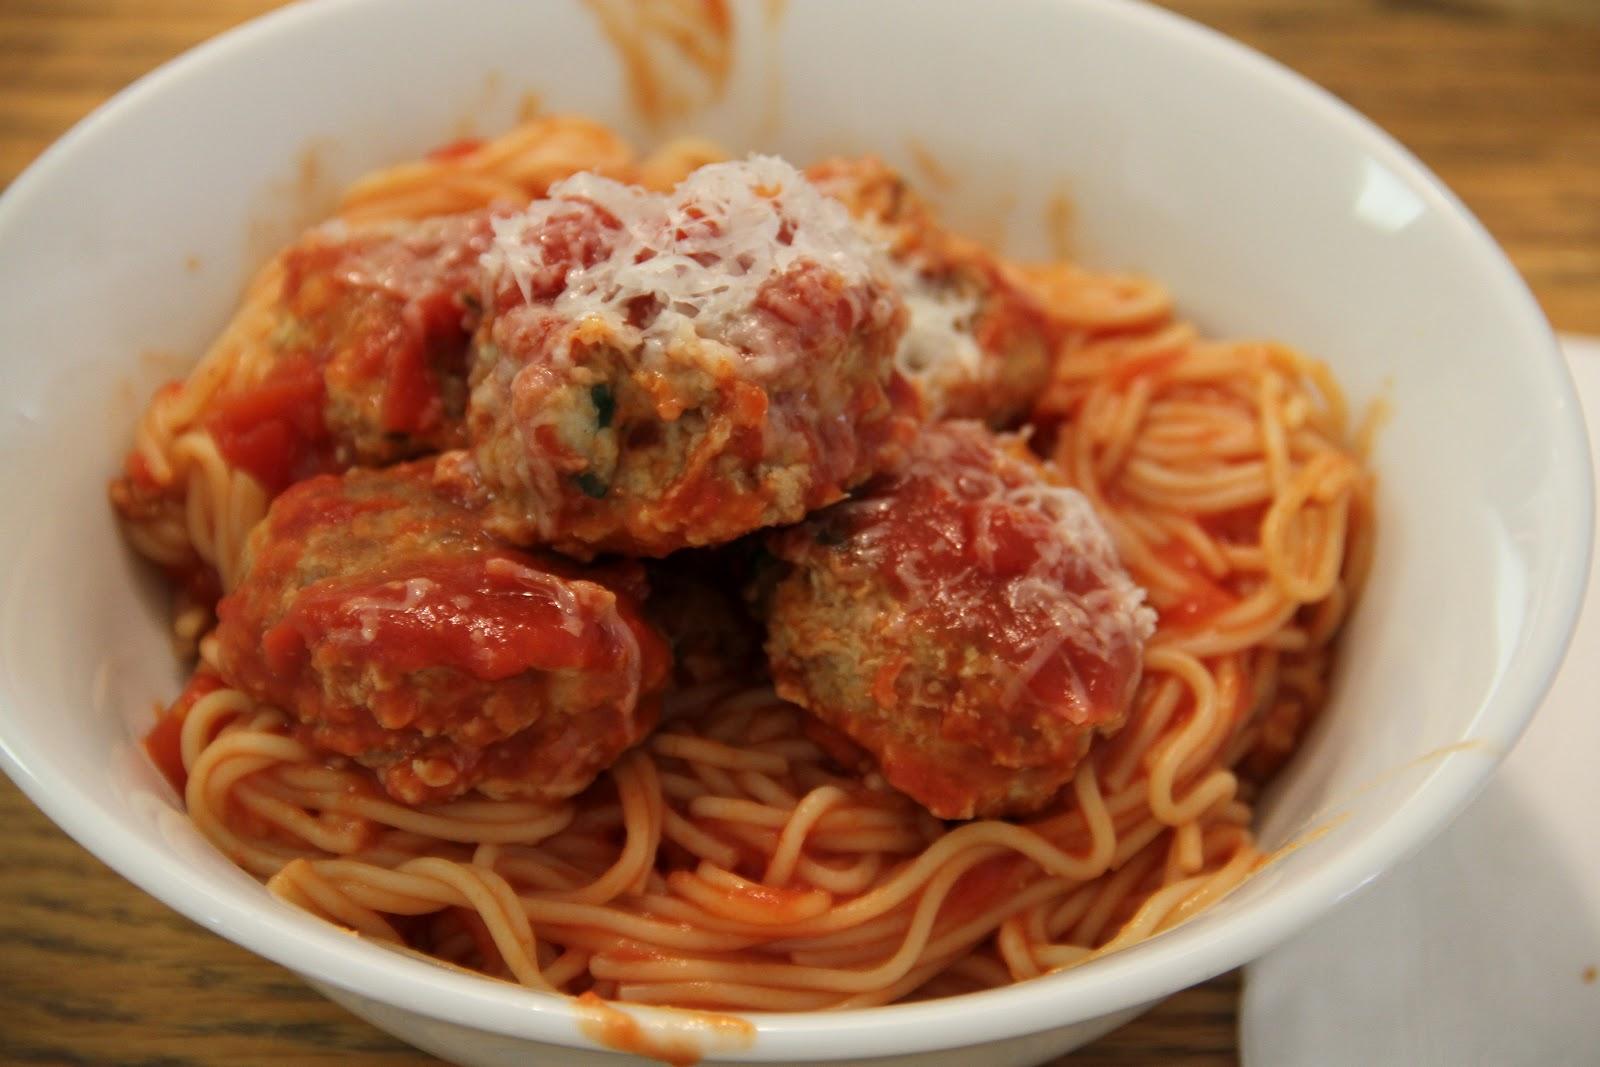 The Coffee Breaker: Easy and Delicious Spaghetti and Meatballs Giada De Laurentiis Parents